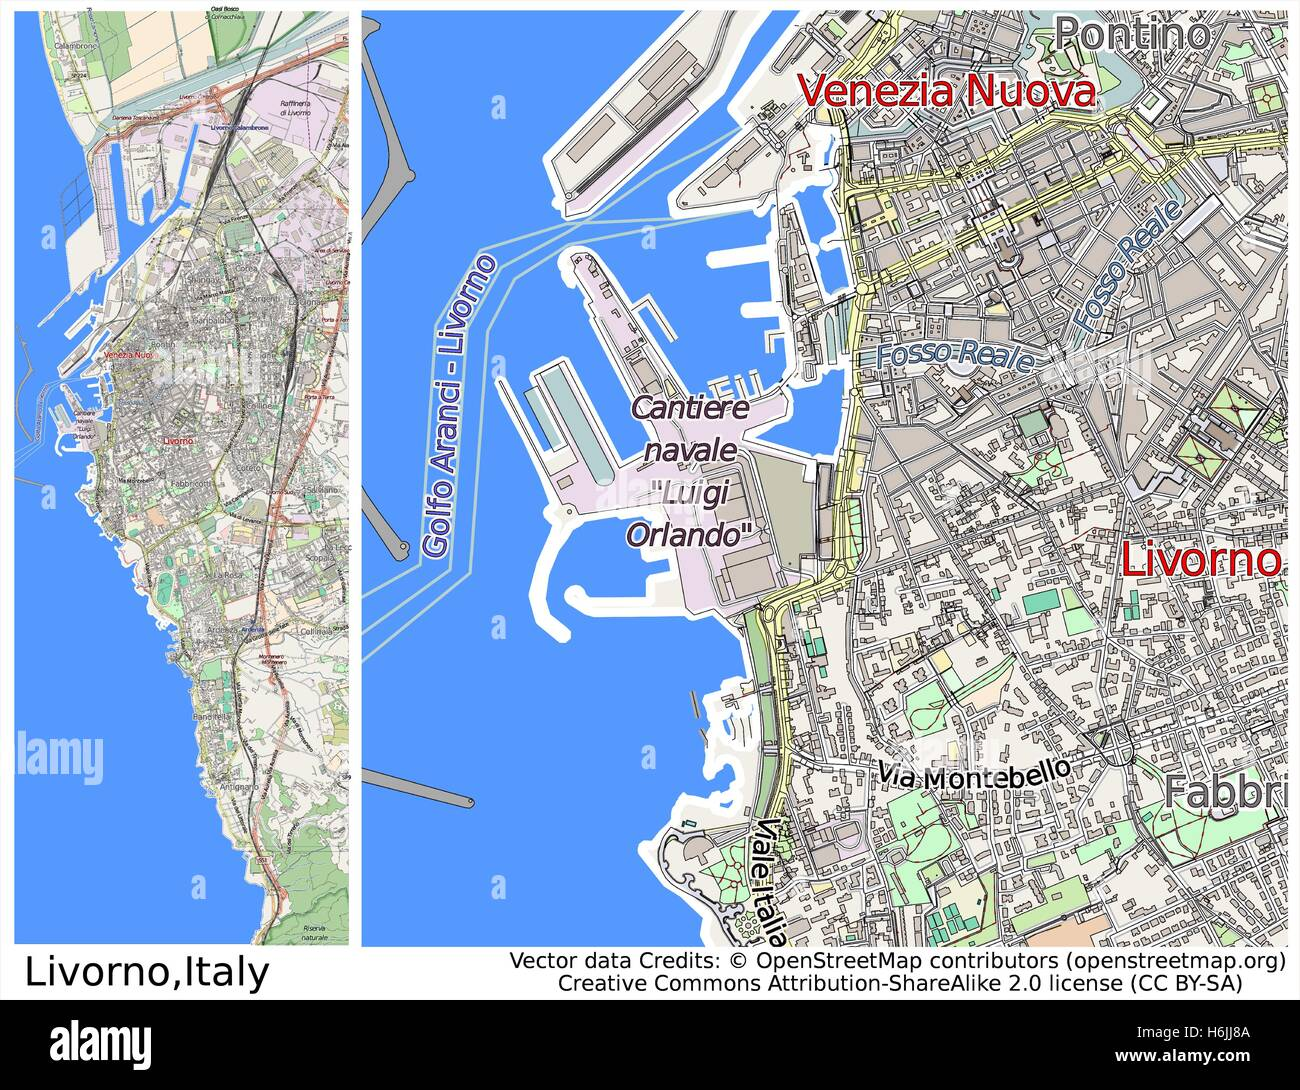 Livorno Italy city map Stock Vector Art Illustration Vector Image